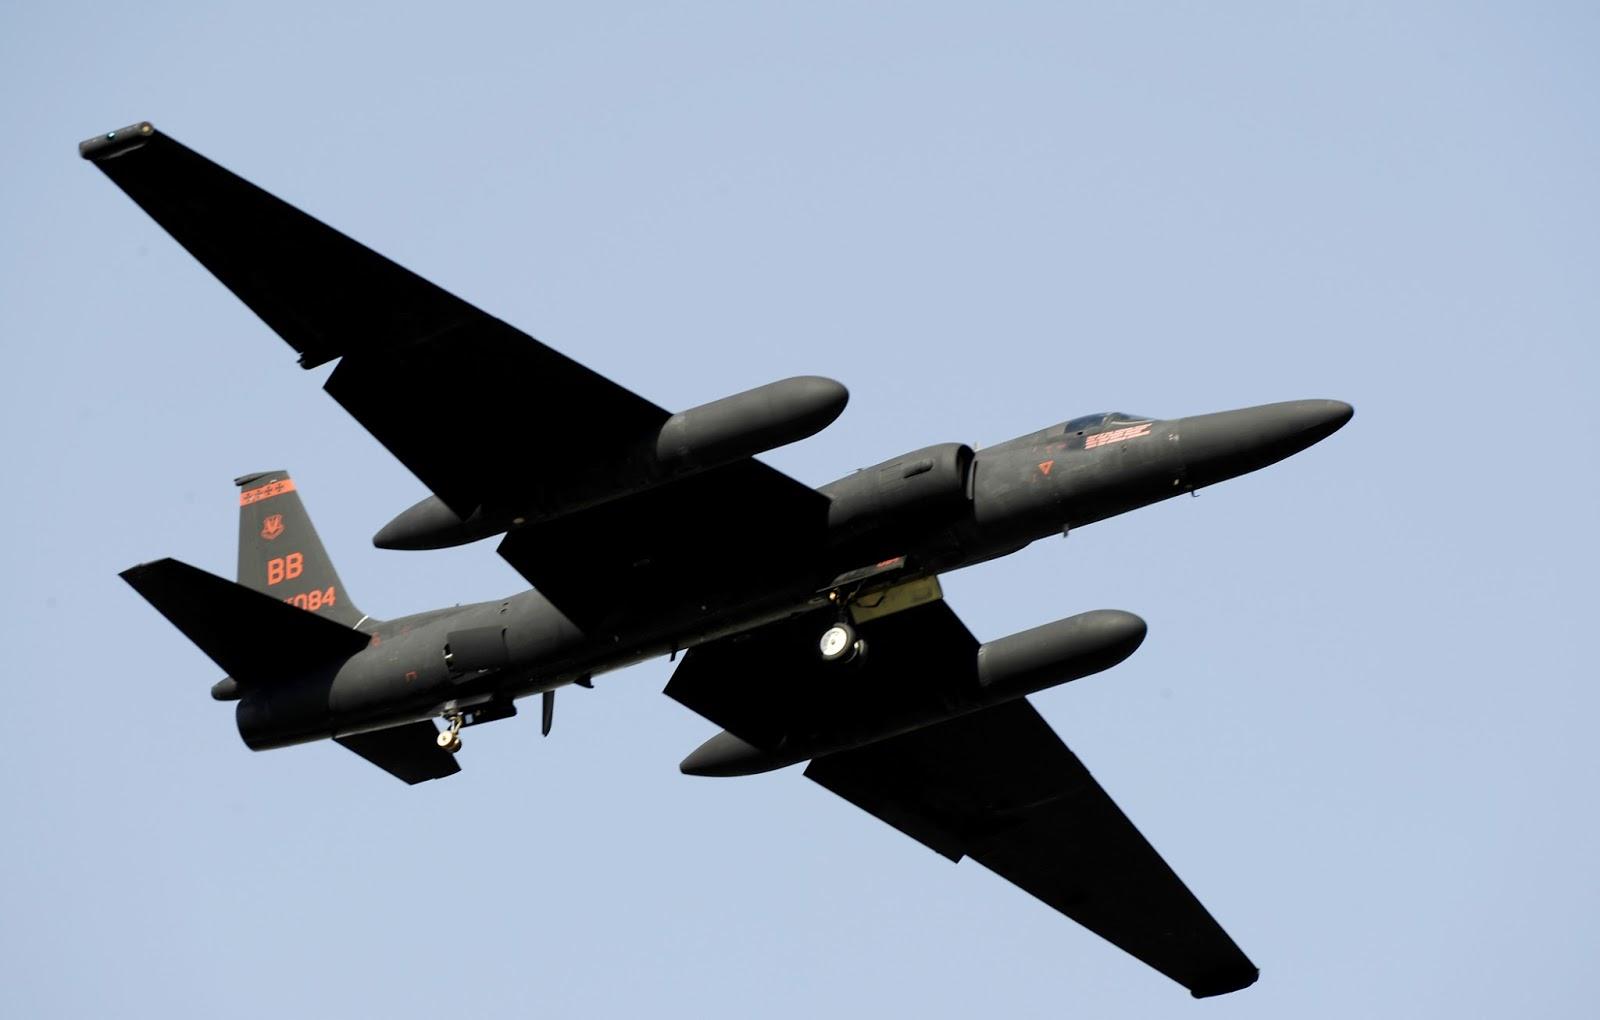 U2 Dragon La... U2 Spy Plane 1960